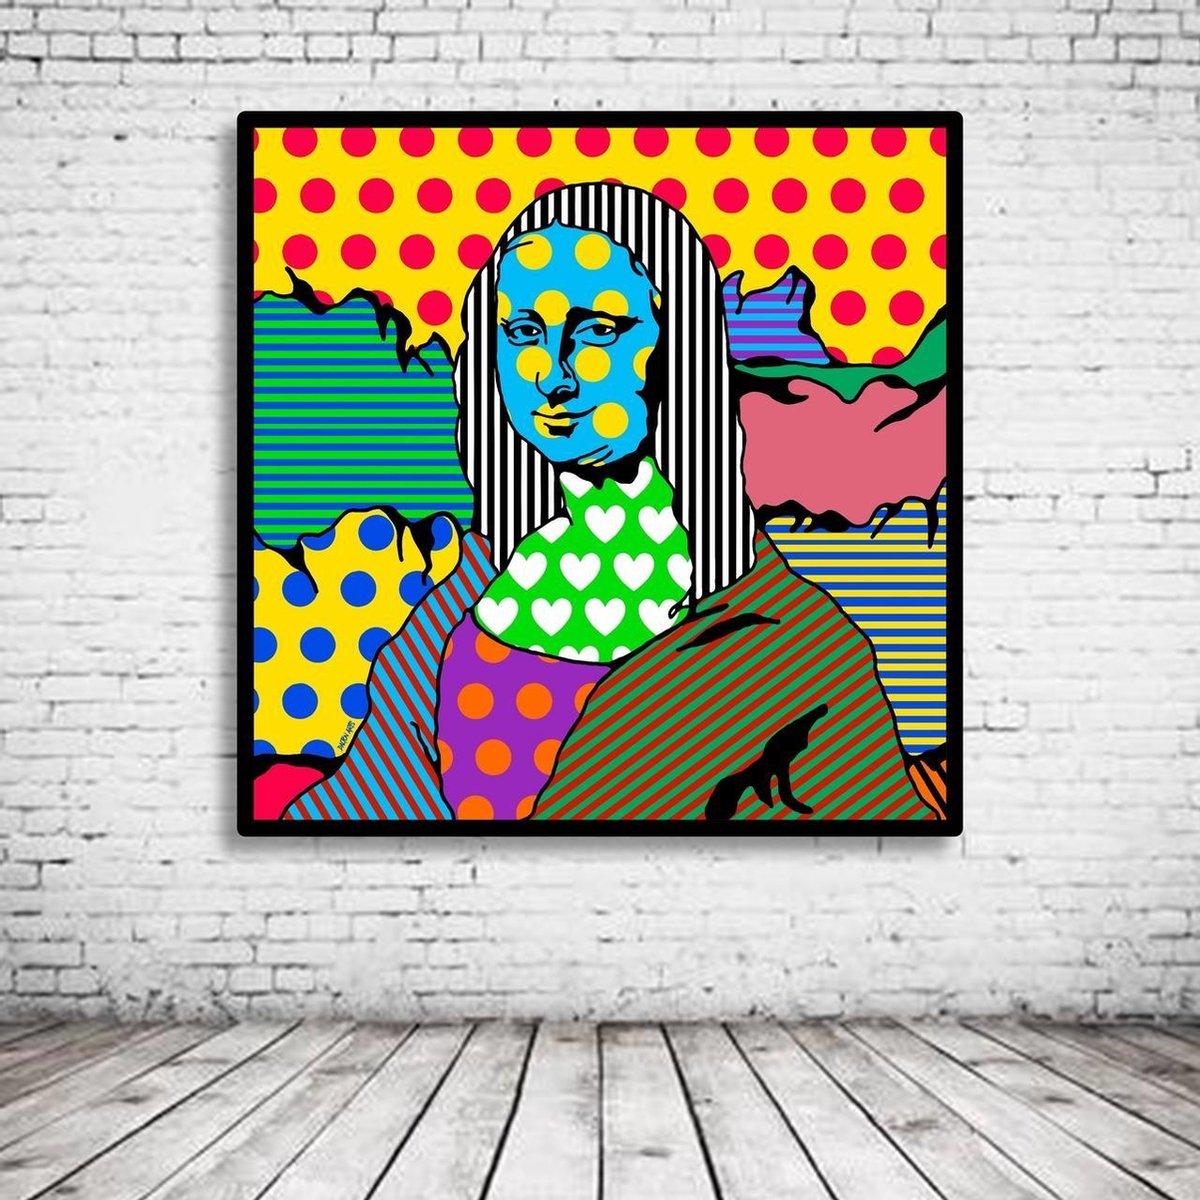 Pop Art Mona Lisa Poster in lijst - 95 x 95 cm Fotopapier Mat 180 gr Framed - Popart Wanddecoratie